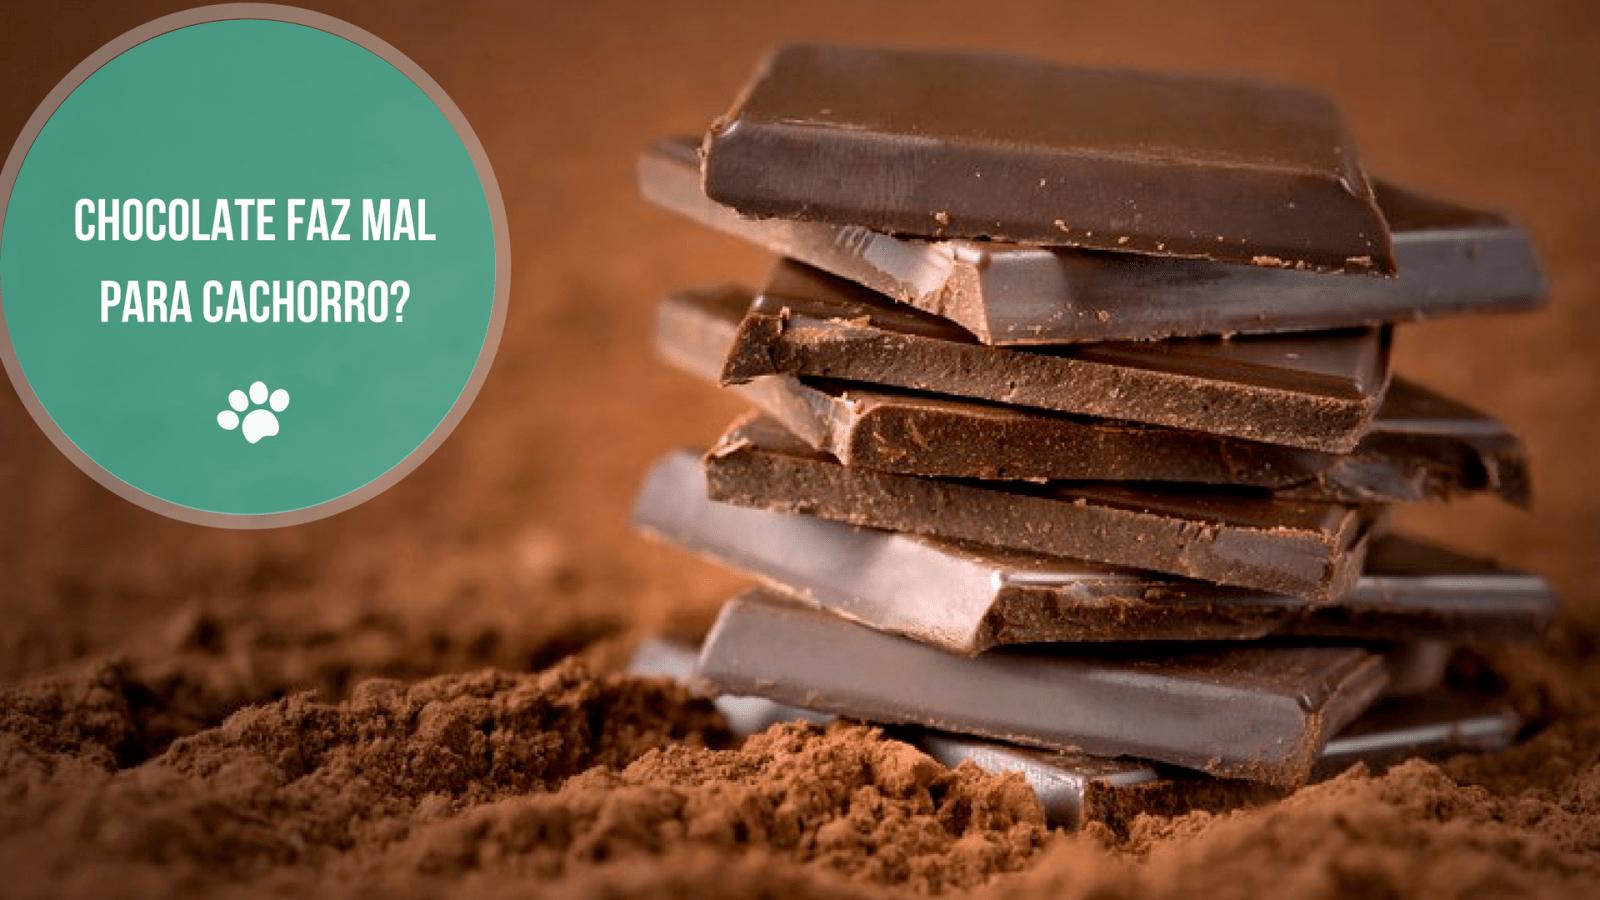 chocolate faz mal para cachorro1 - CHOCOLATE FAZ MAL PRA CACHORRO?